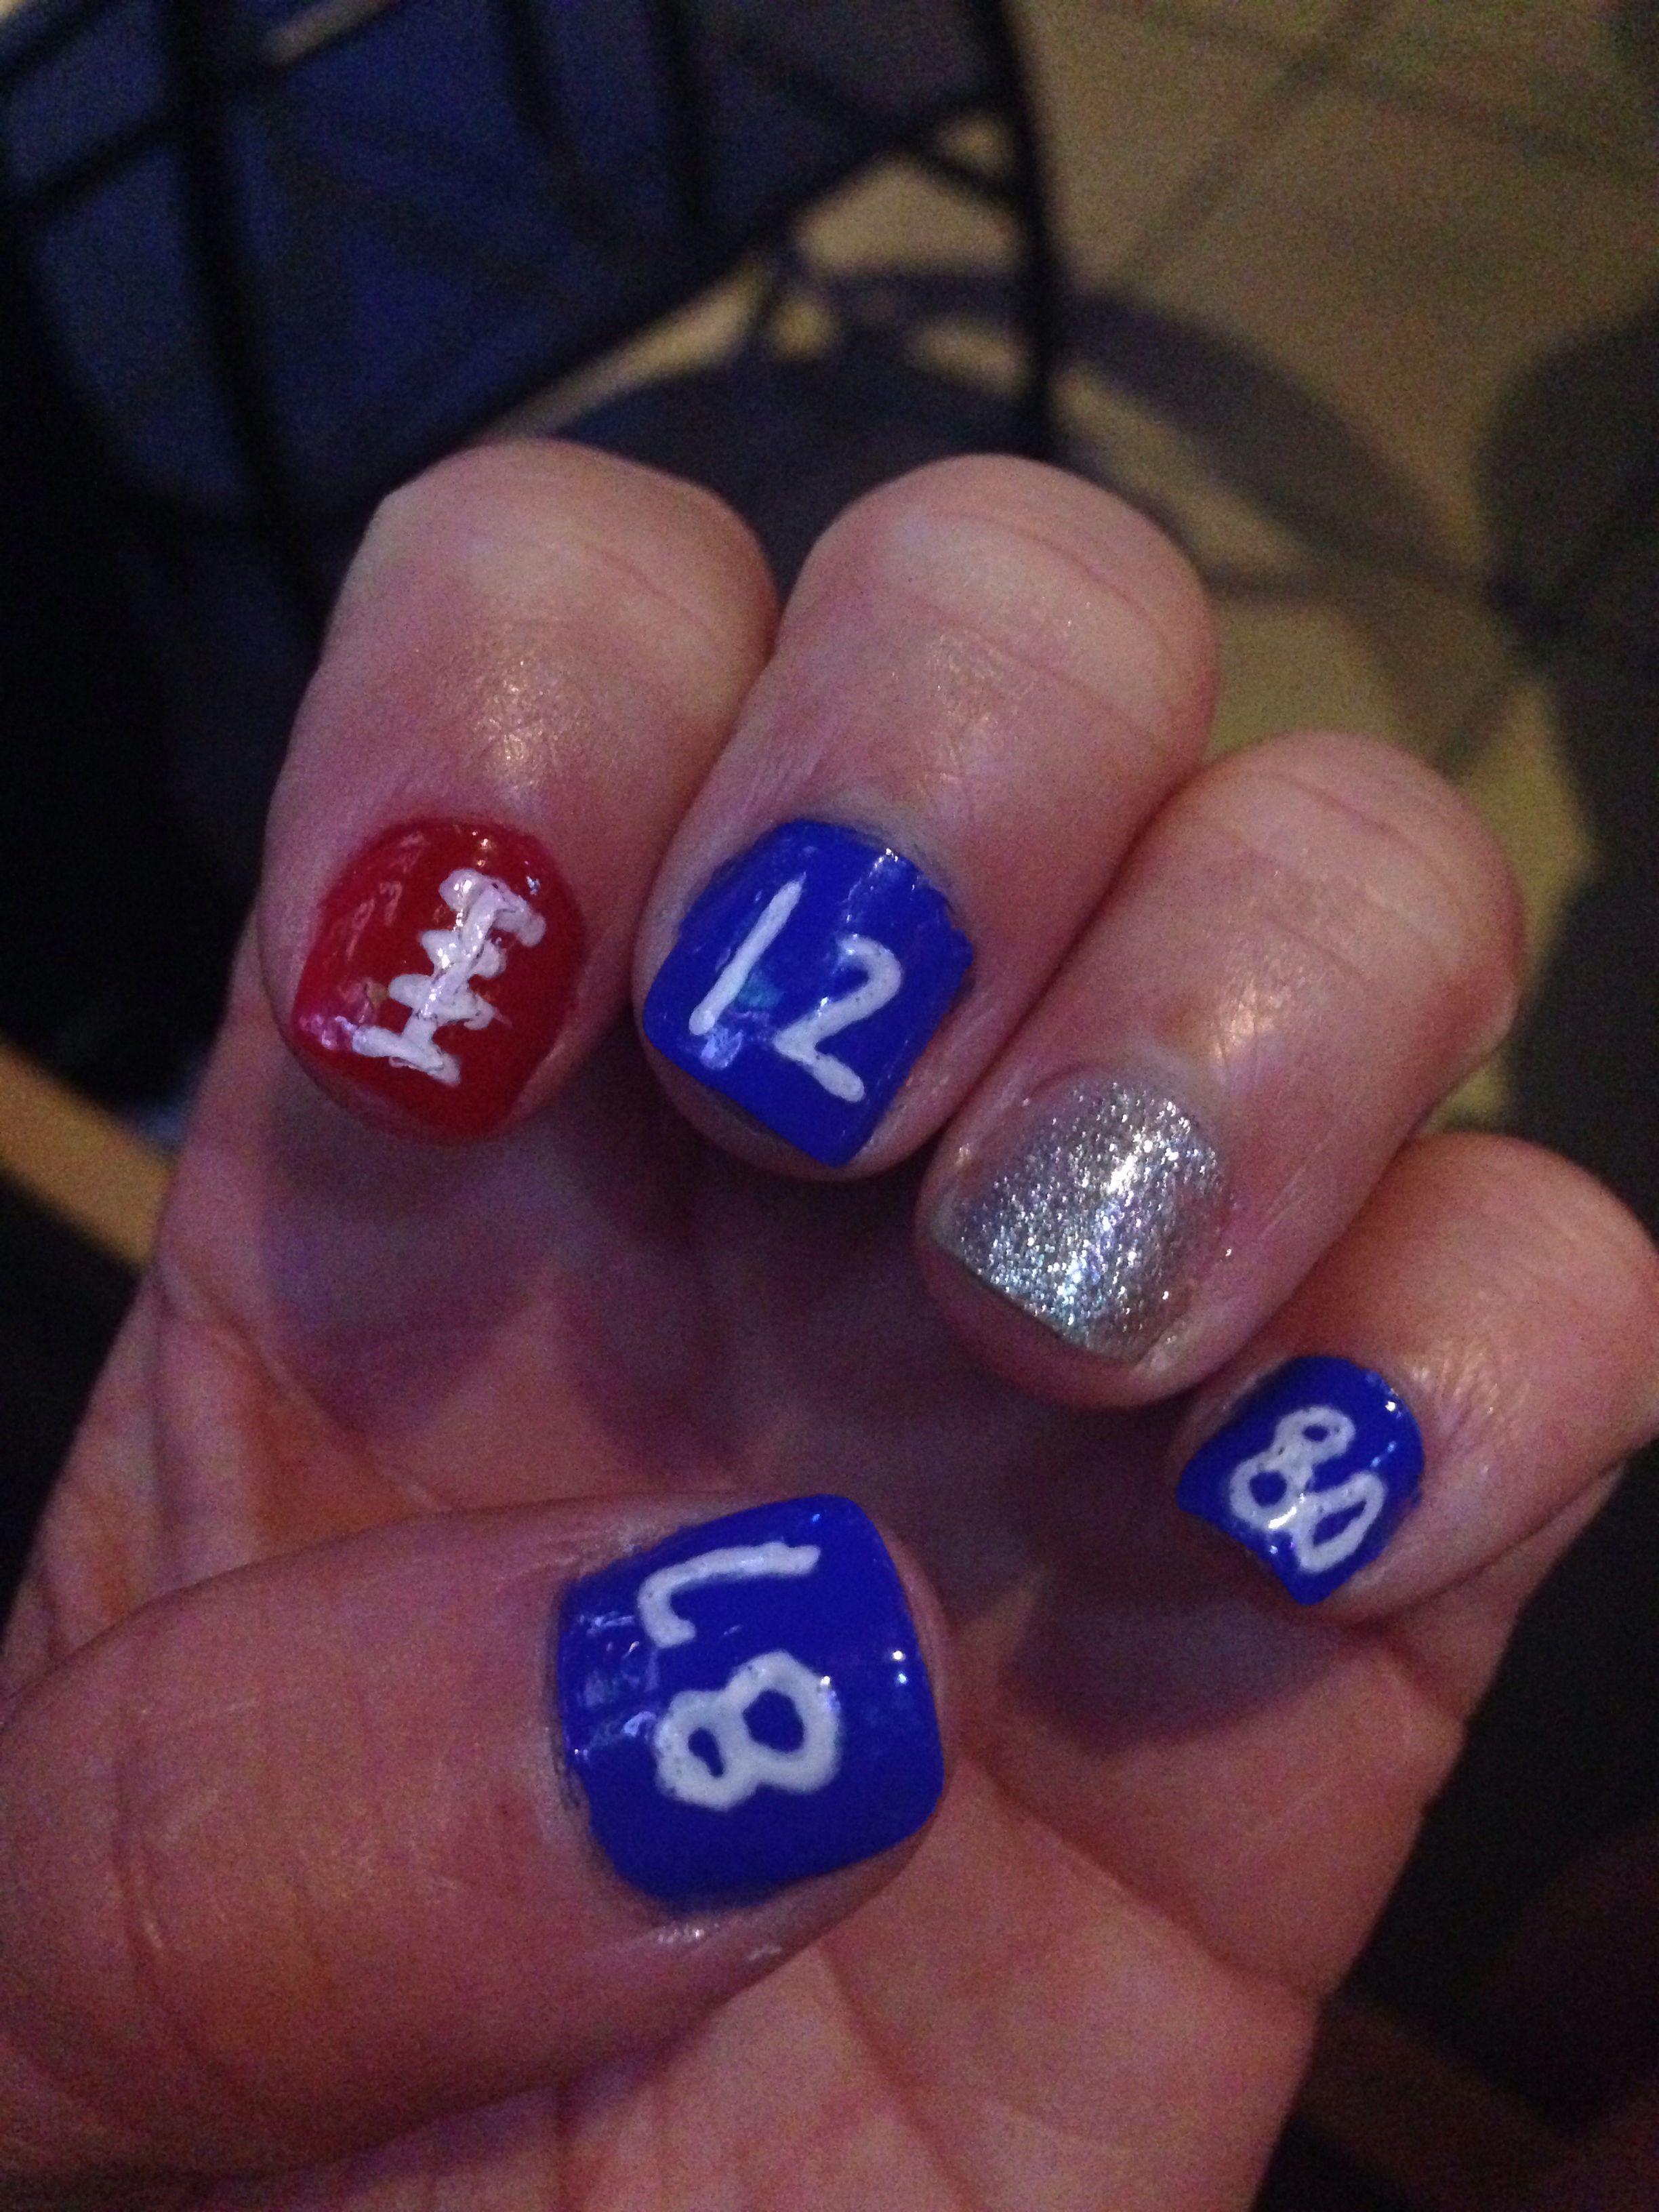 New England patriots nail art | Nail art | Pinterest